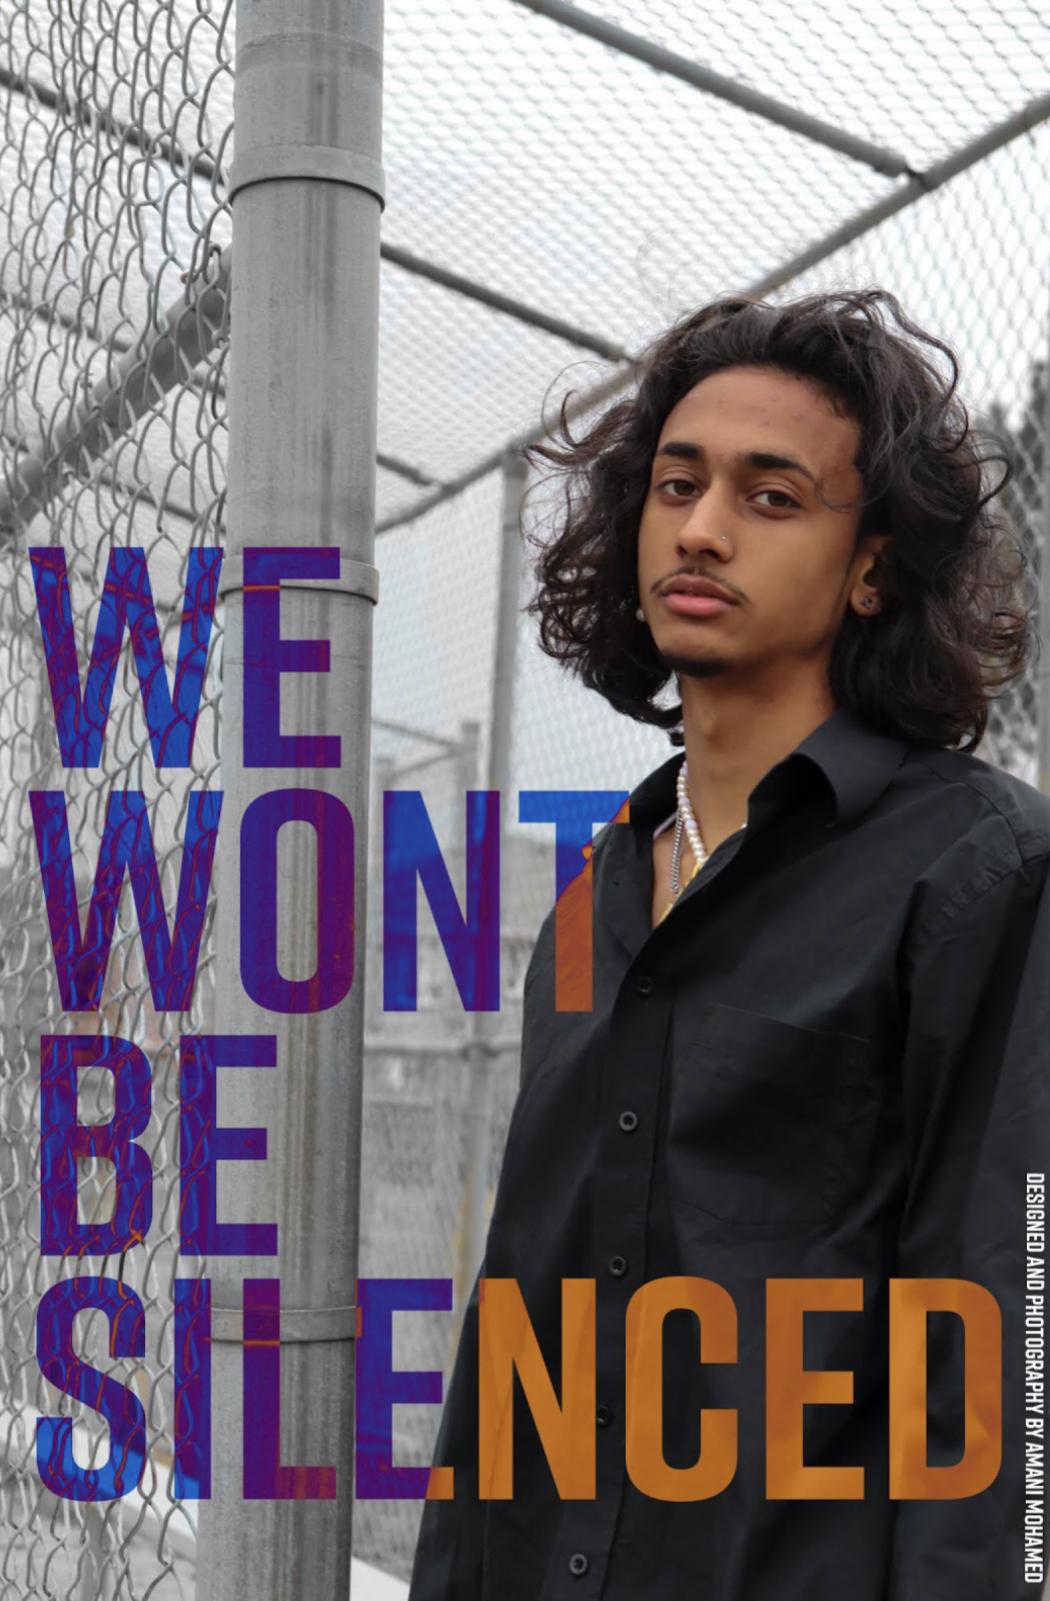 We Wont Be Silenced